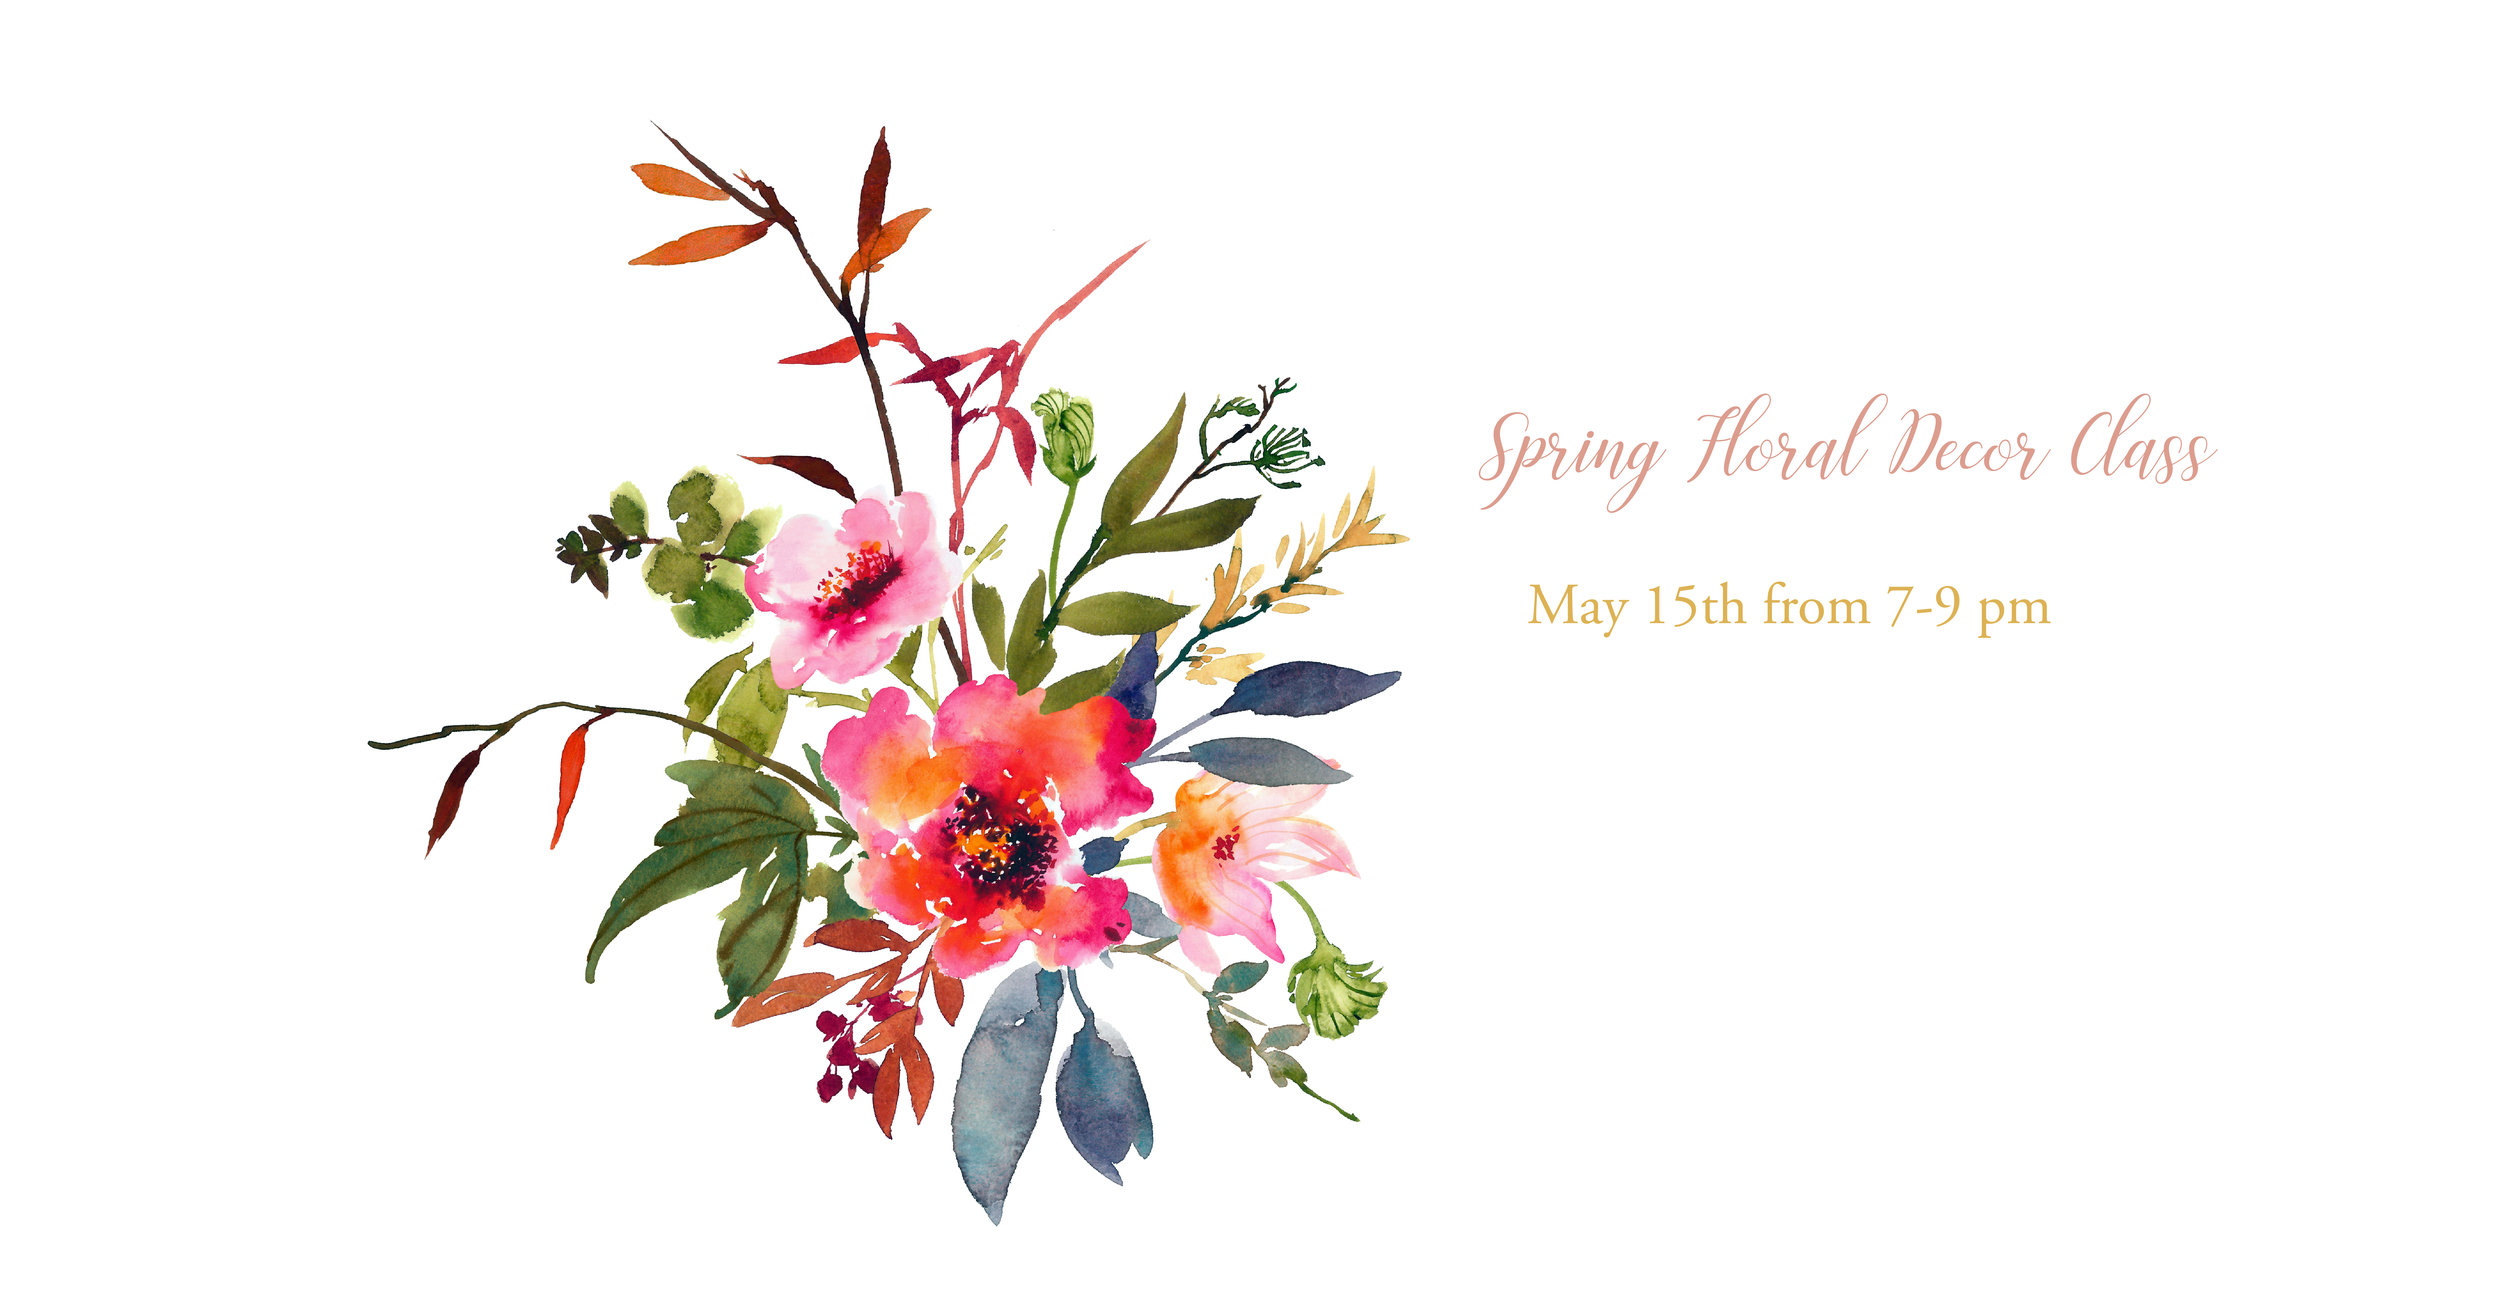 Spring Floral Decor